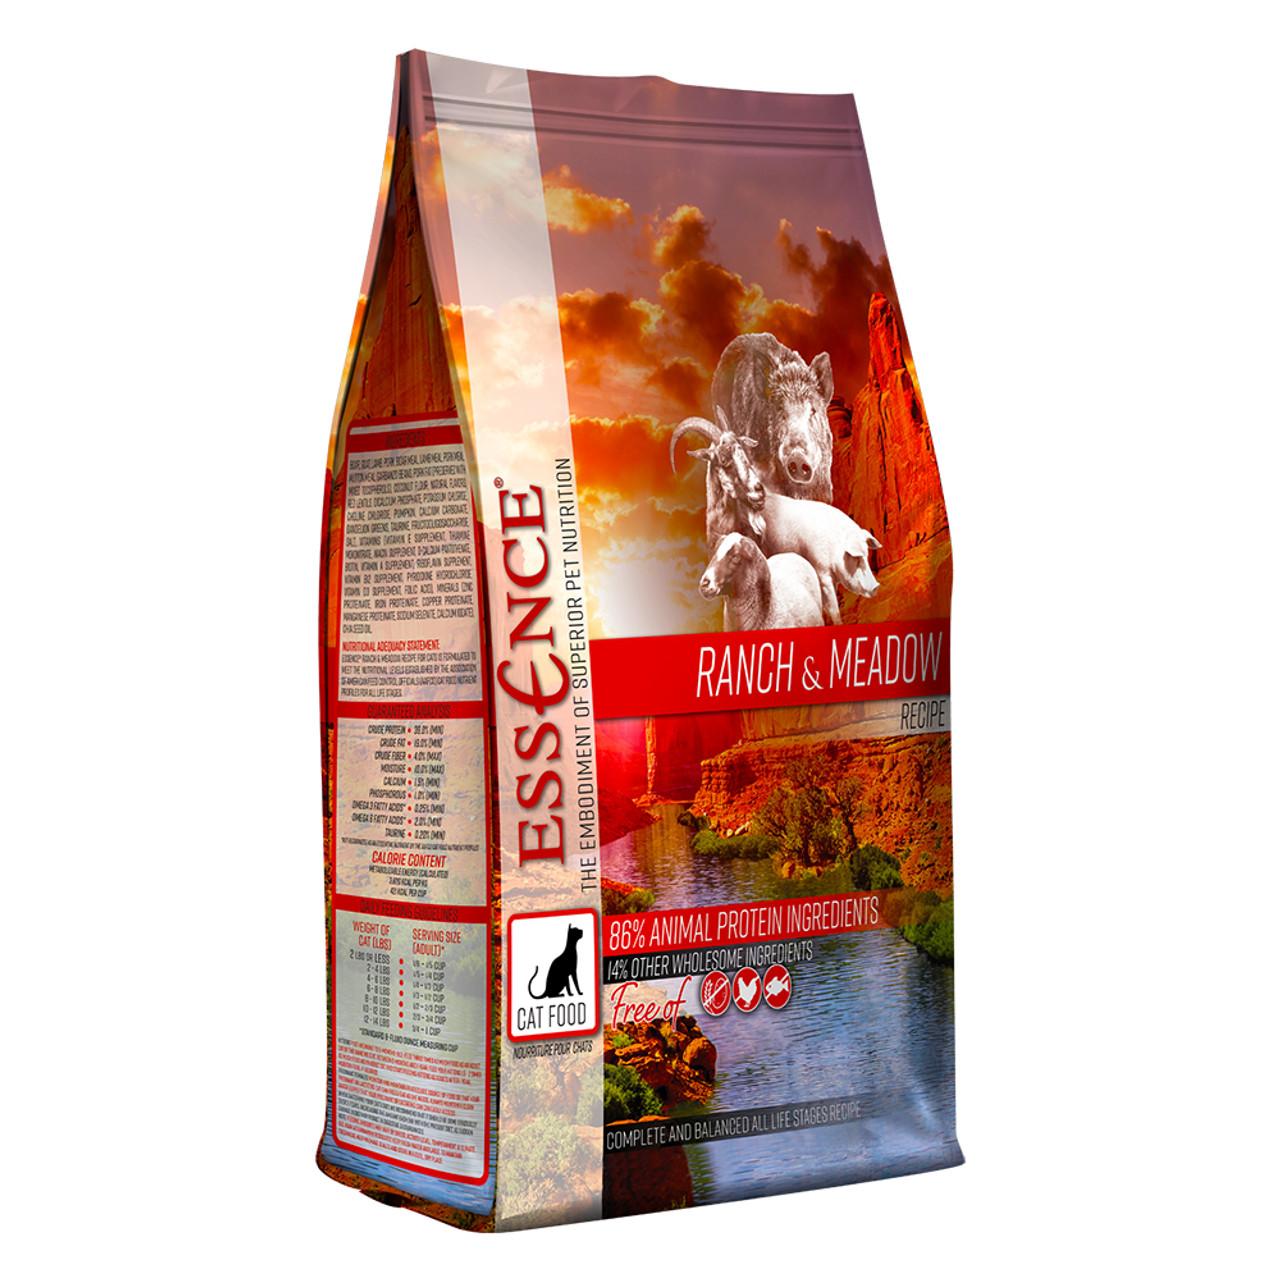 Essence Ranch & Meadow Recipe Dry Cat Food